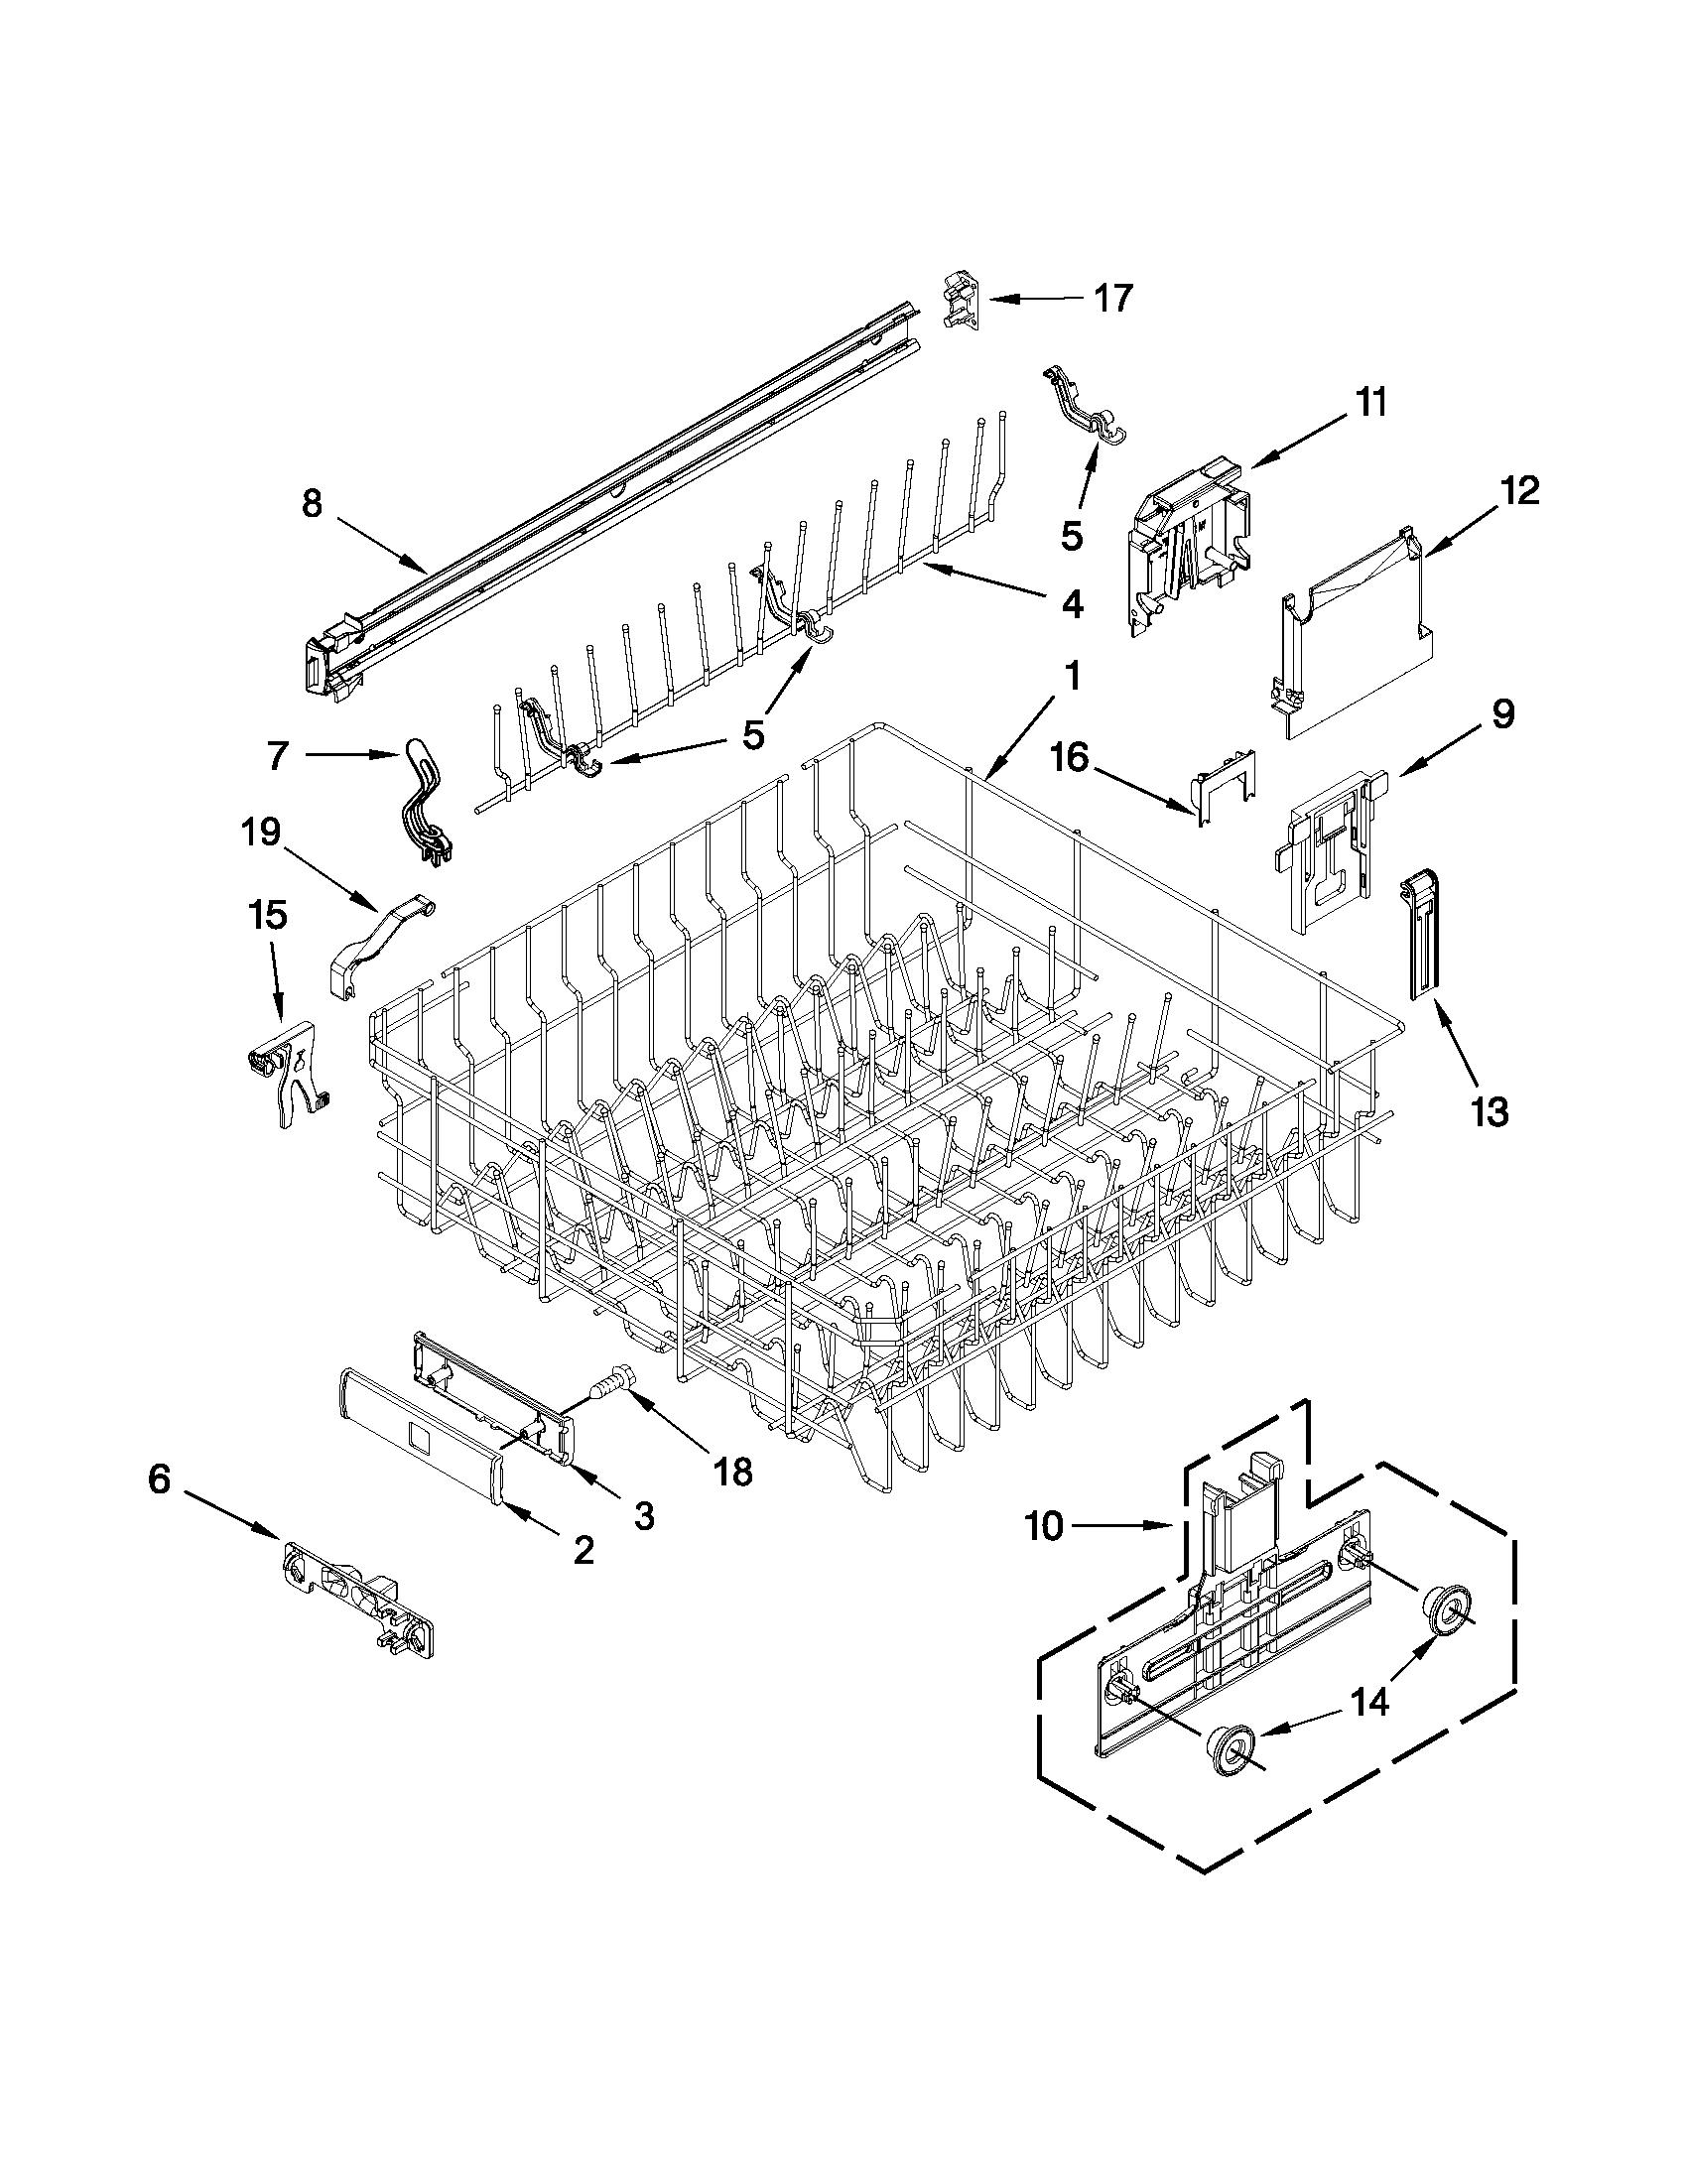 wiring diagram for kenmore elite dishwasher data schematic diagram kenmore elite dishwasher model 66512769k310 upper rack [ 1700 x 2201 Pixel ]